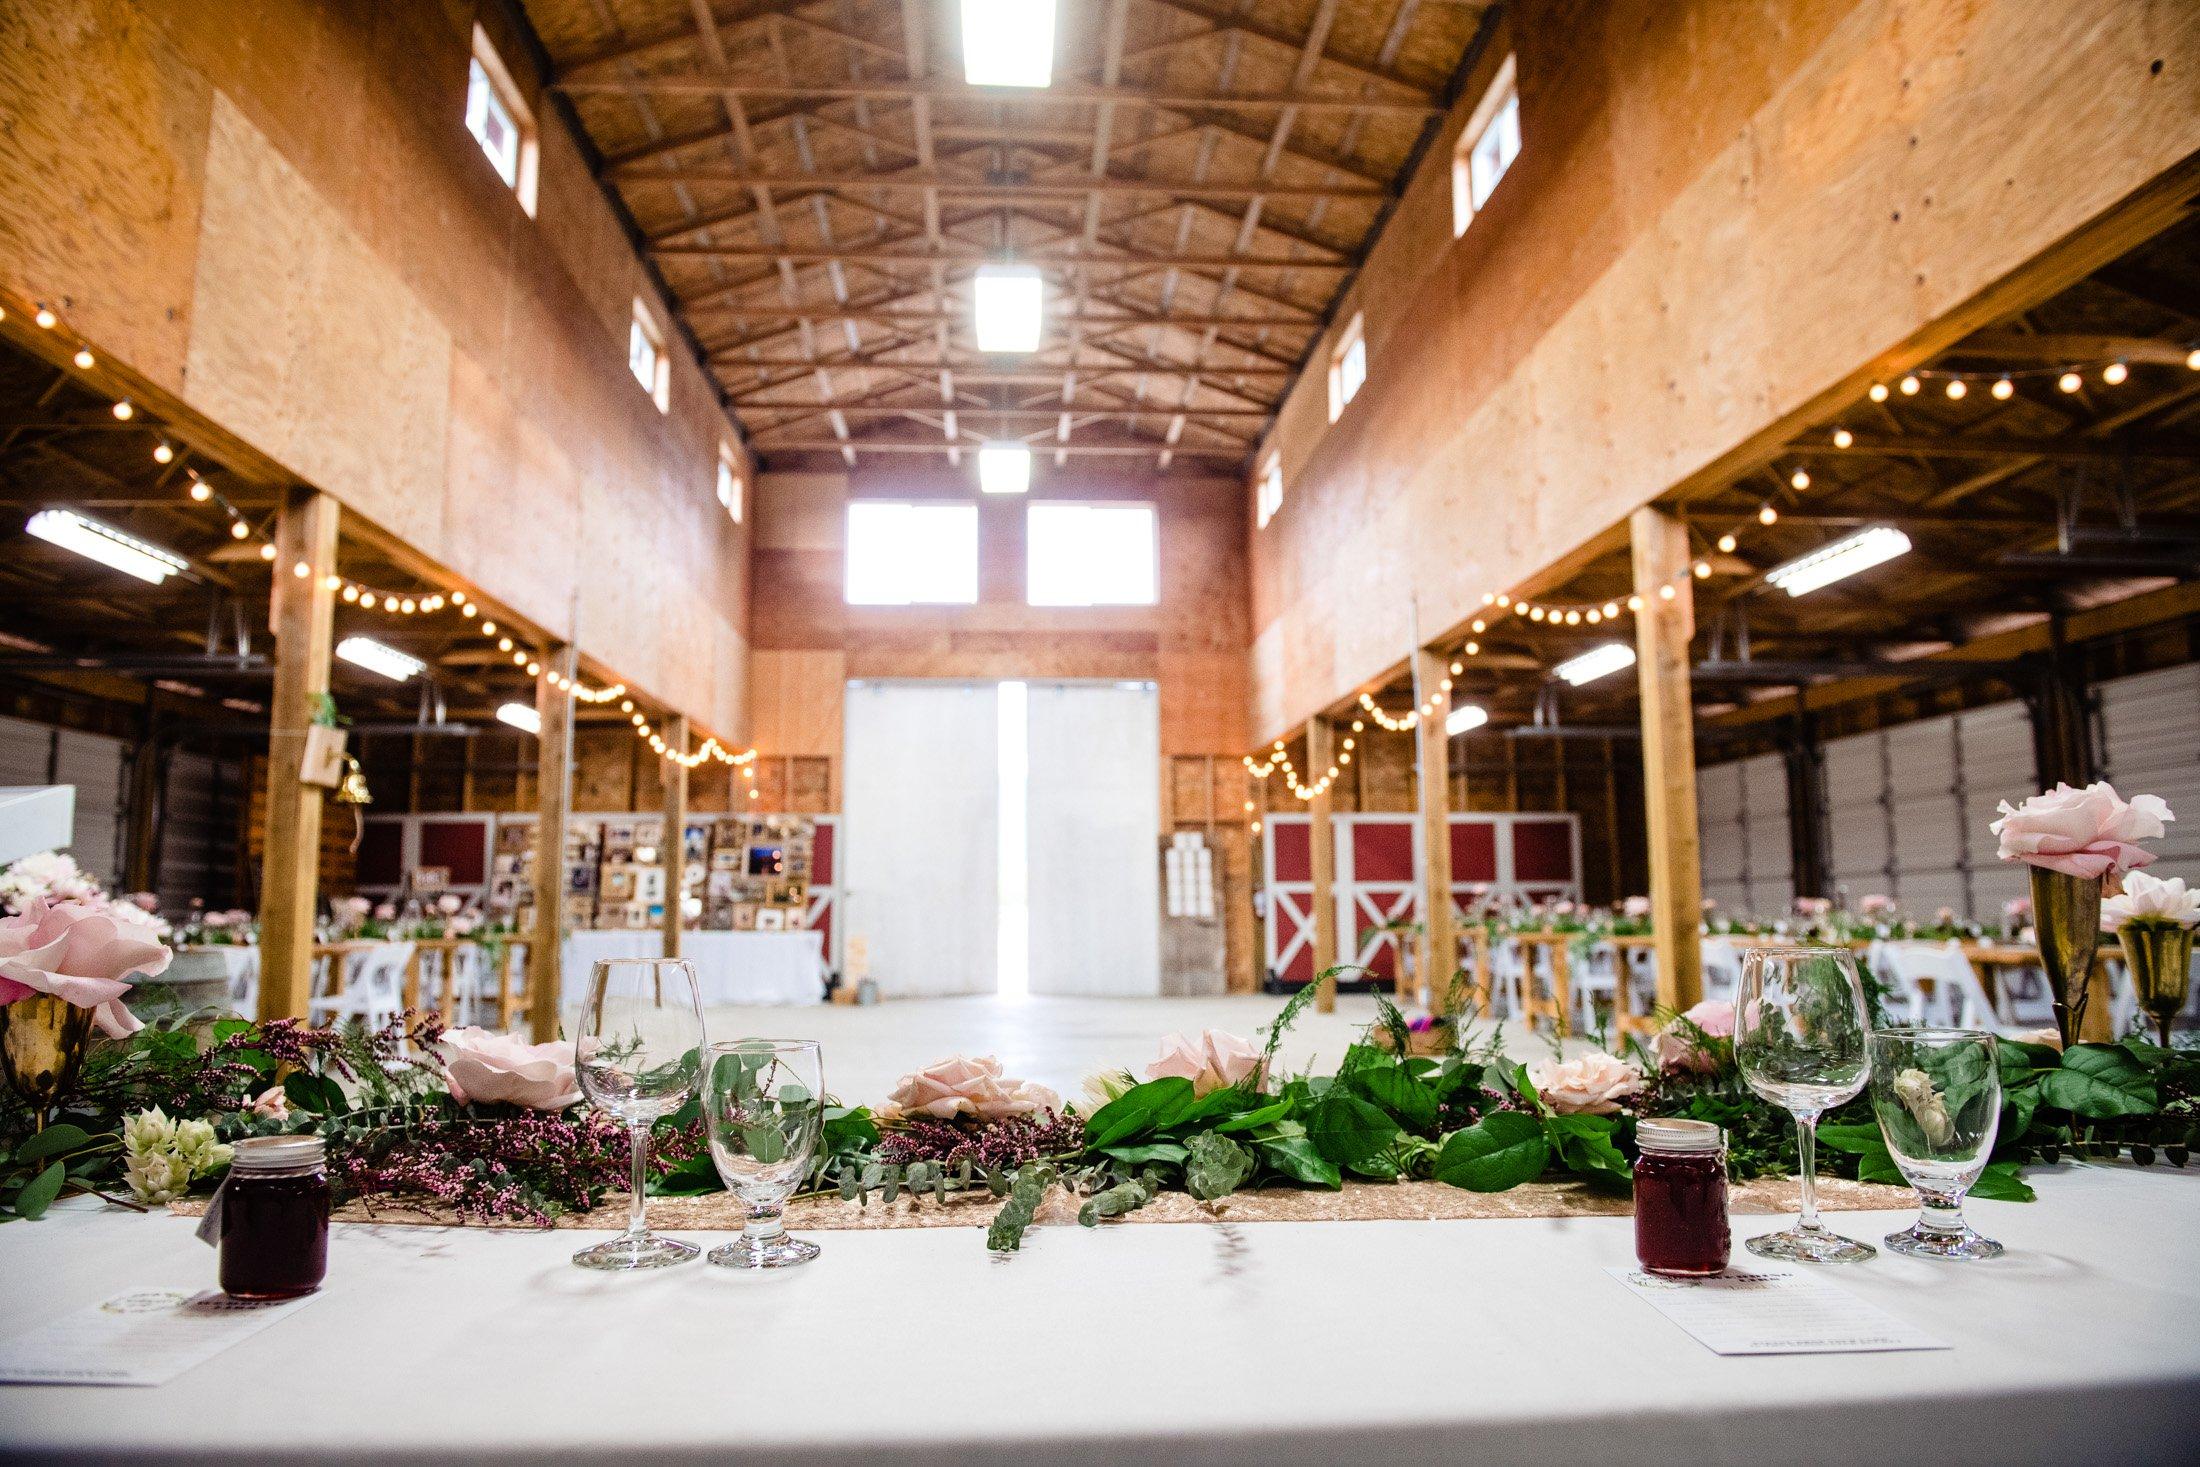 017 - barns for weddings near vancouver